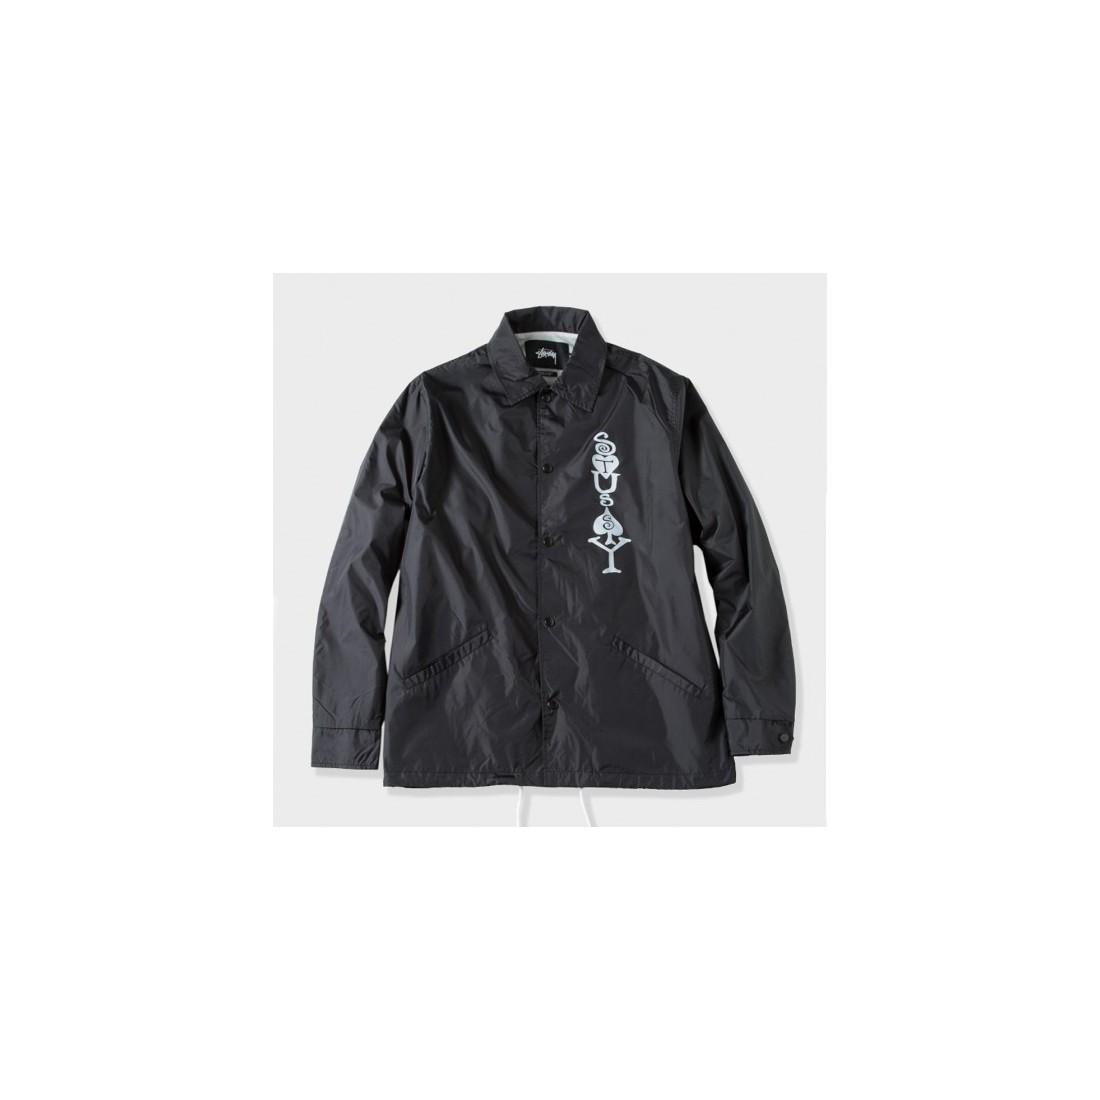 024d684d5 ... Men// Jackets//Player Coaches Jacket Black. Player Coaches Jacket Black